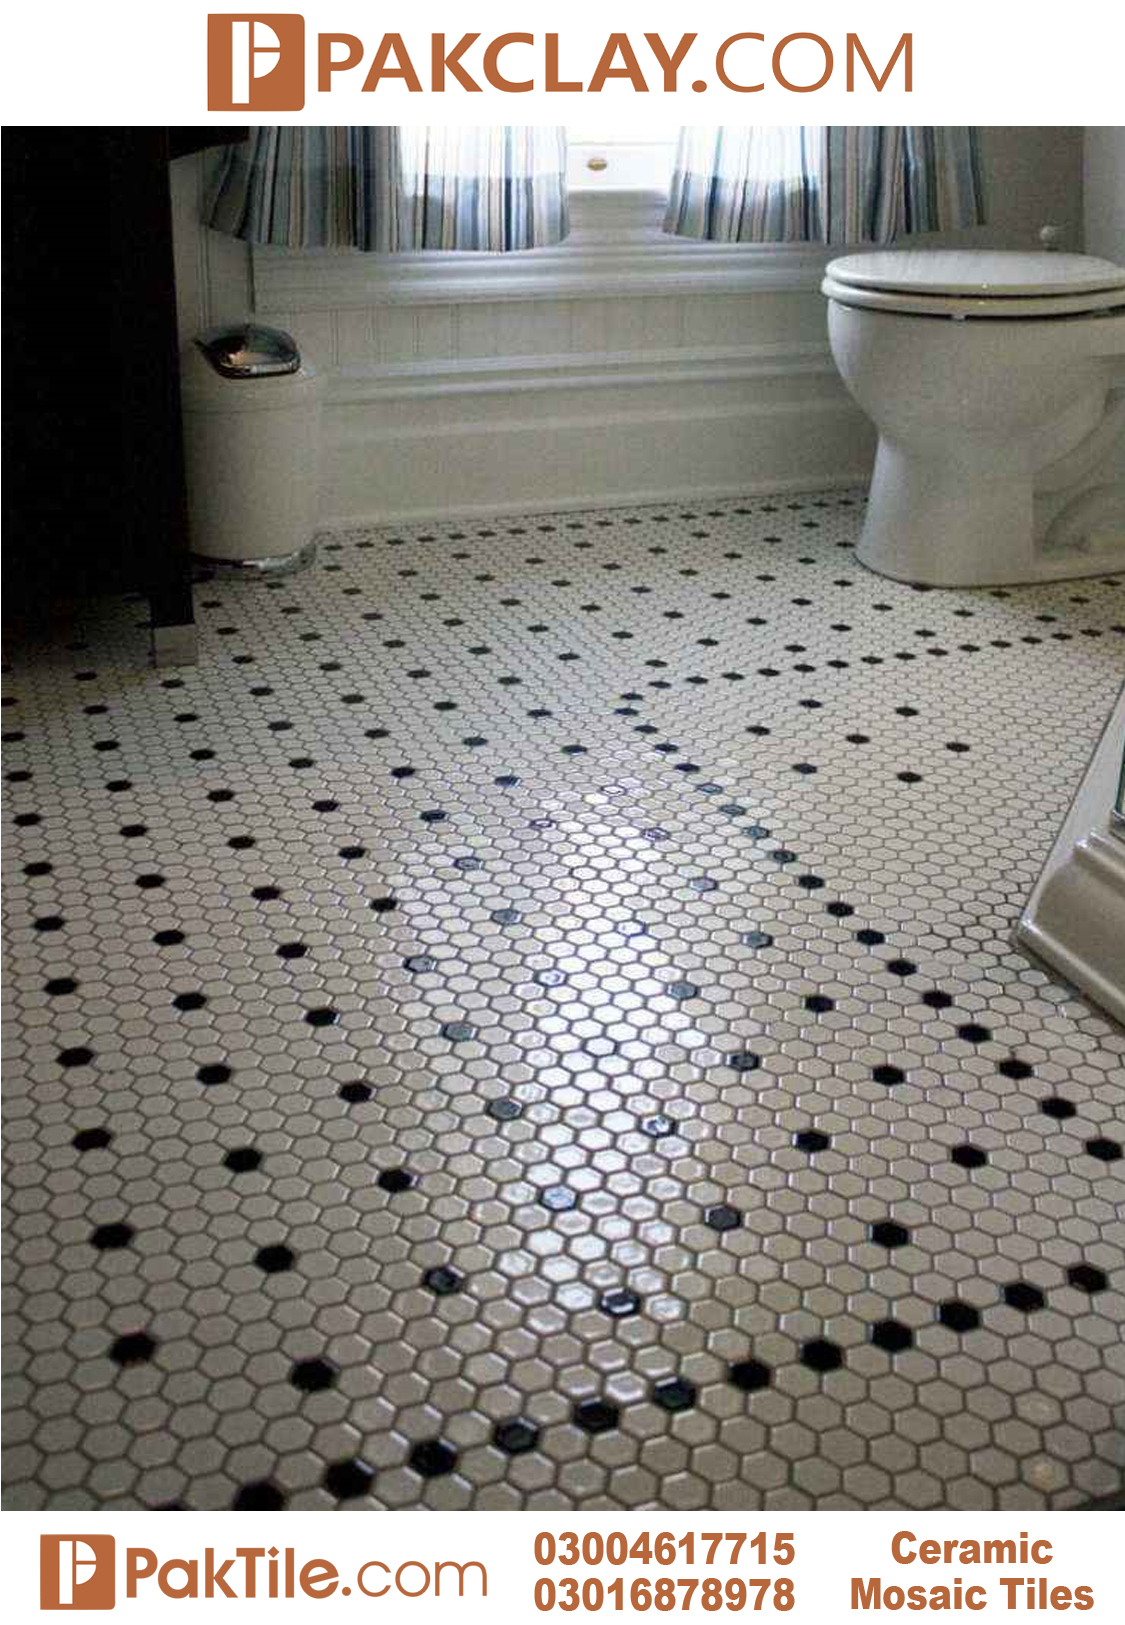 Hexagon Mosaic Floor Tiles Colors White and Black